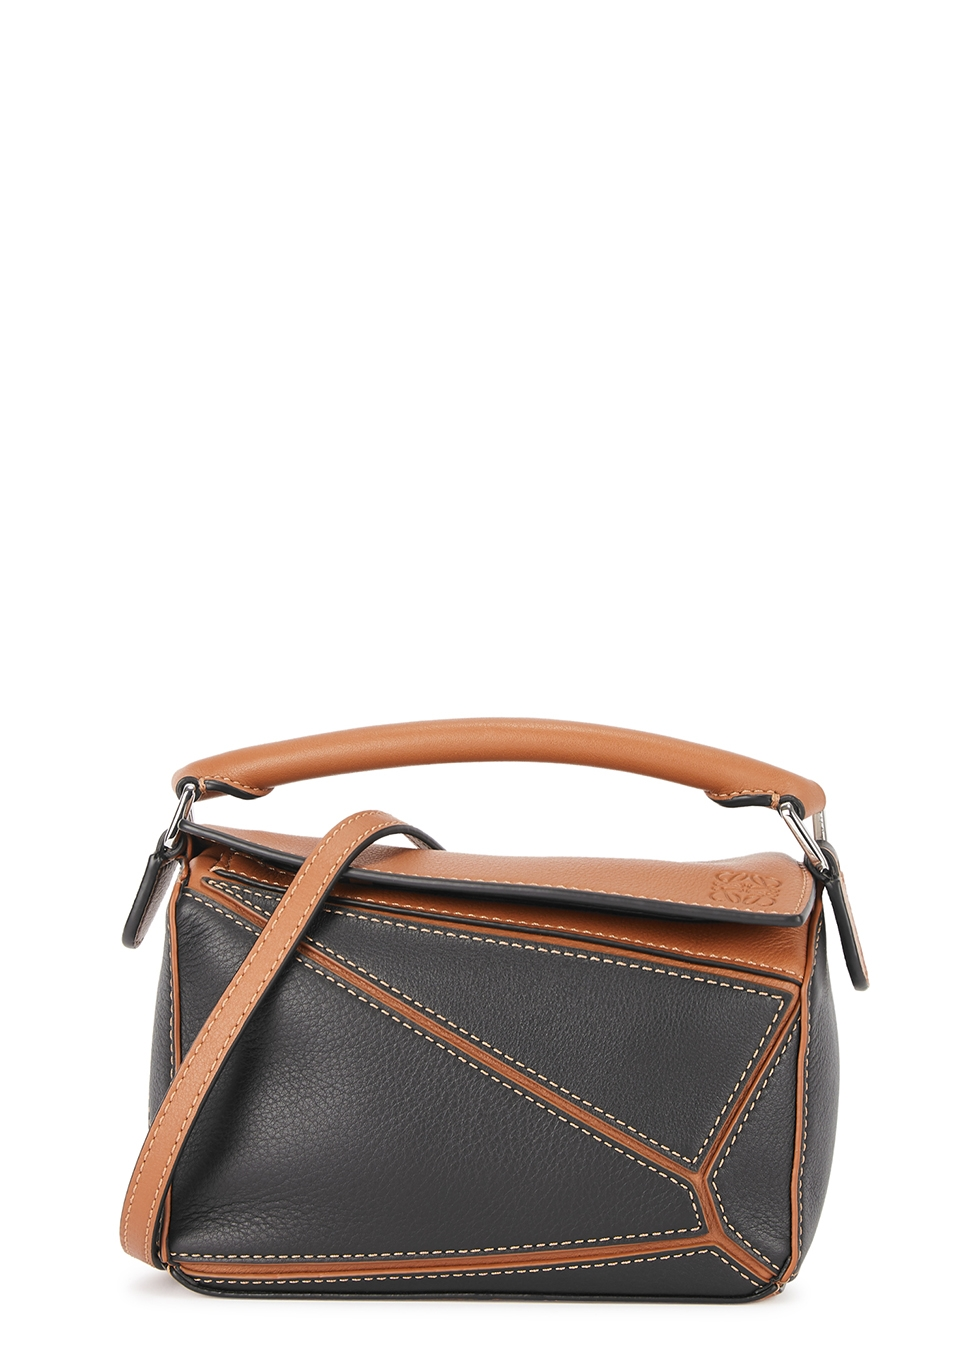 Puzzle mini two-tone leather cross-body bag